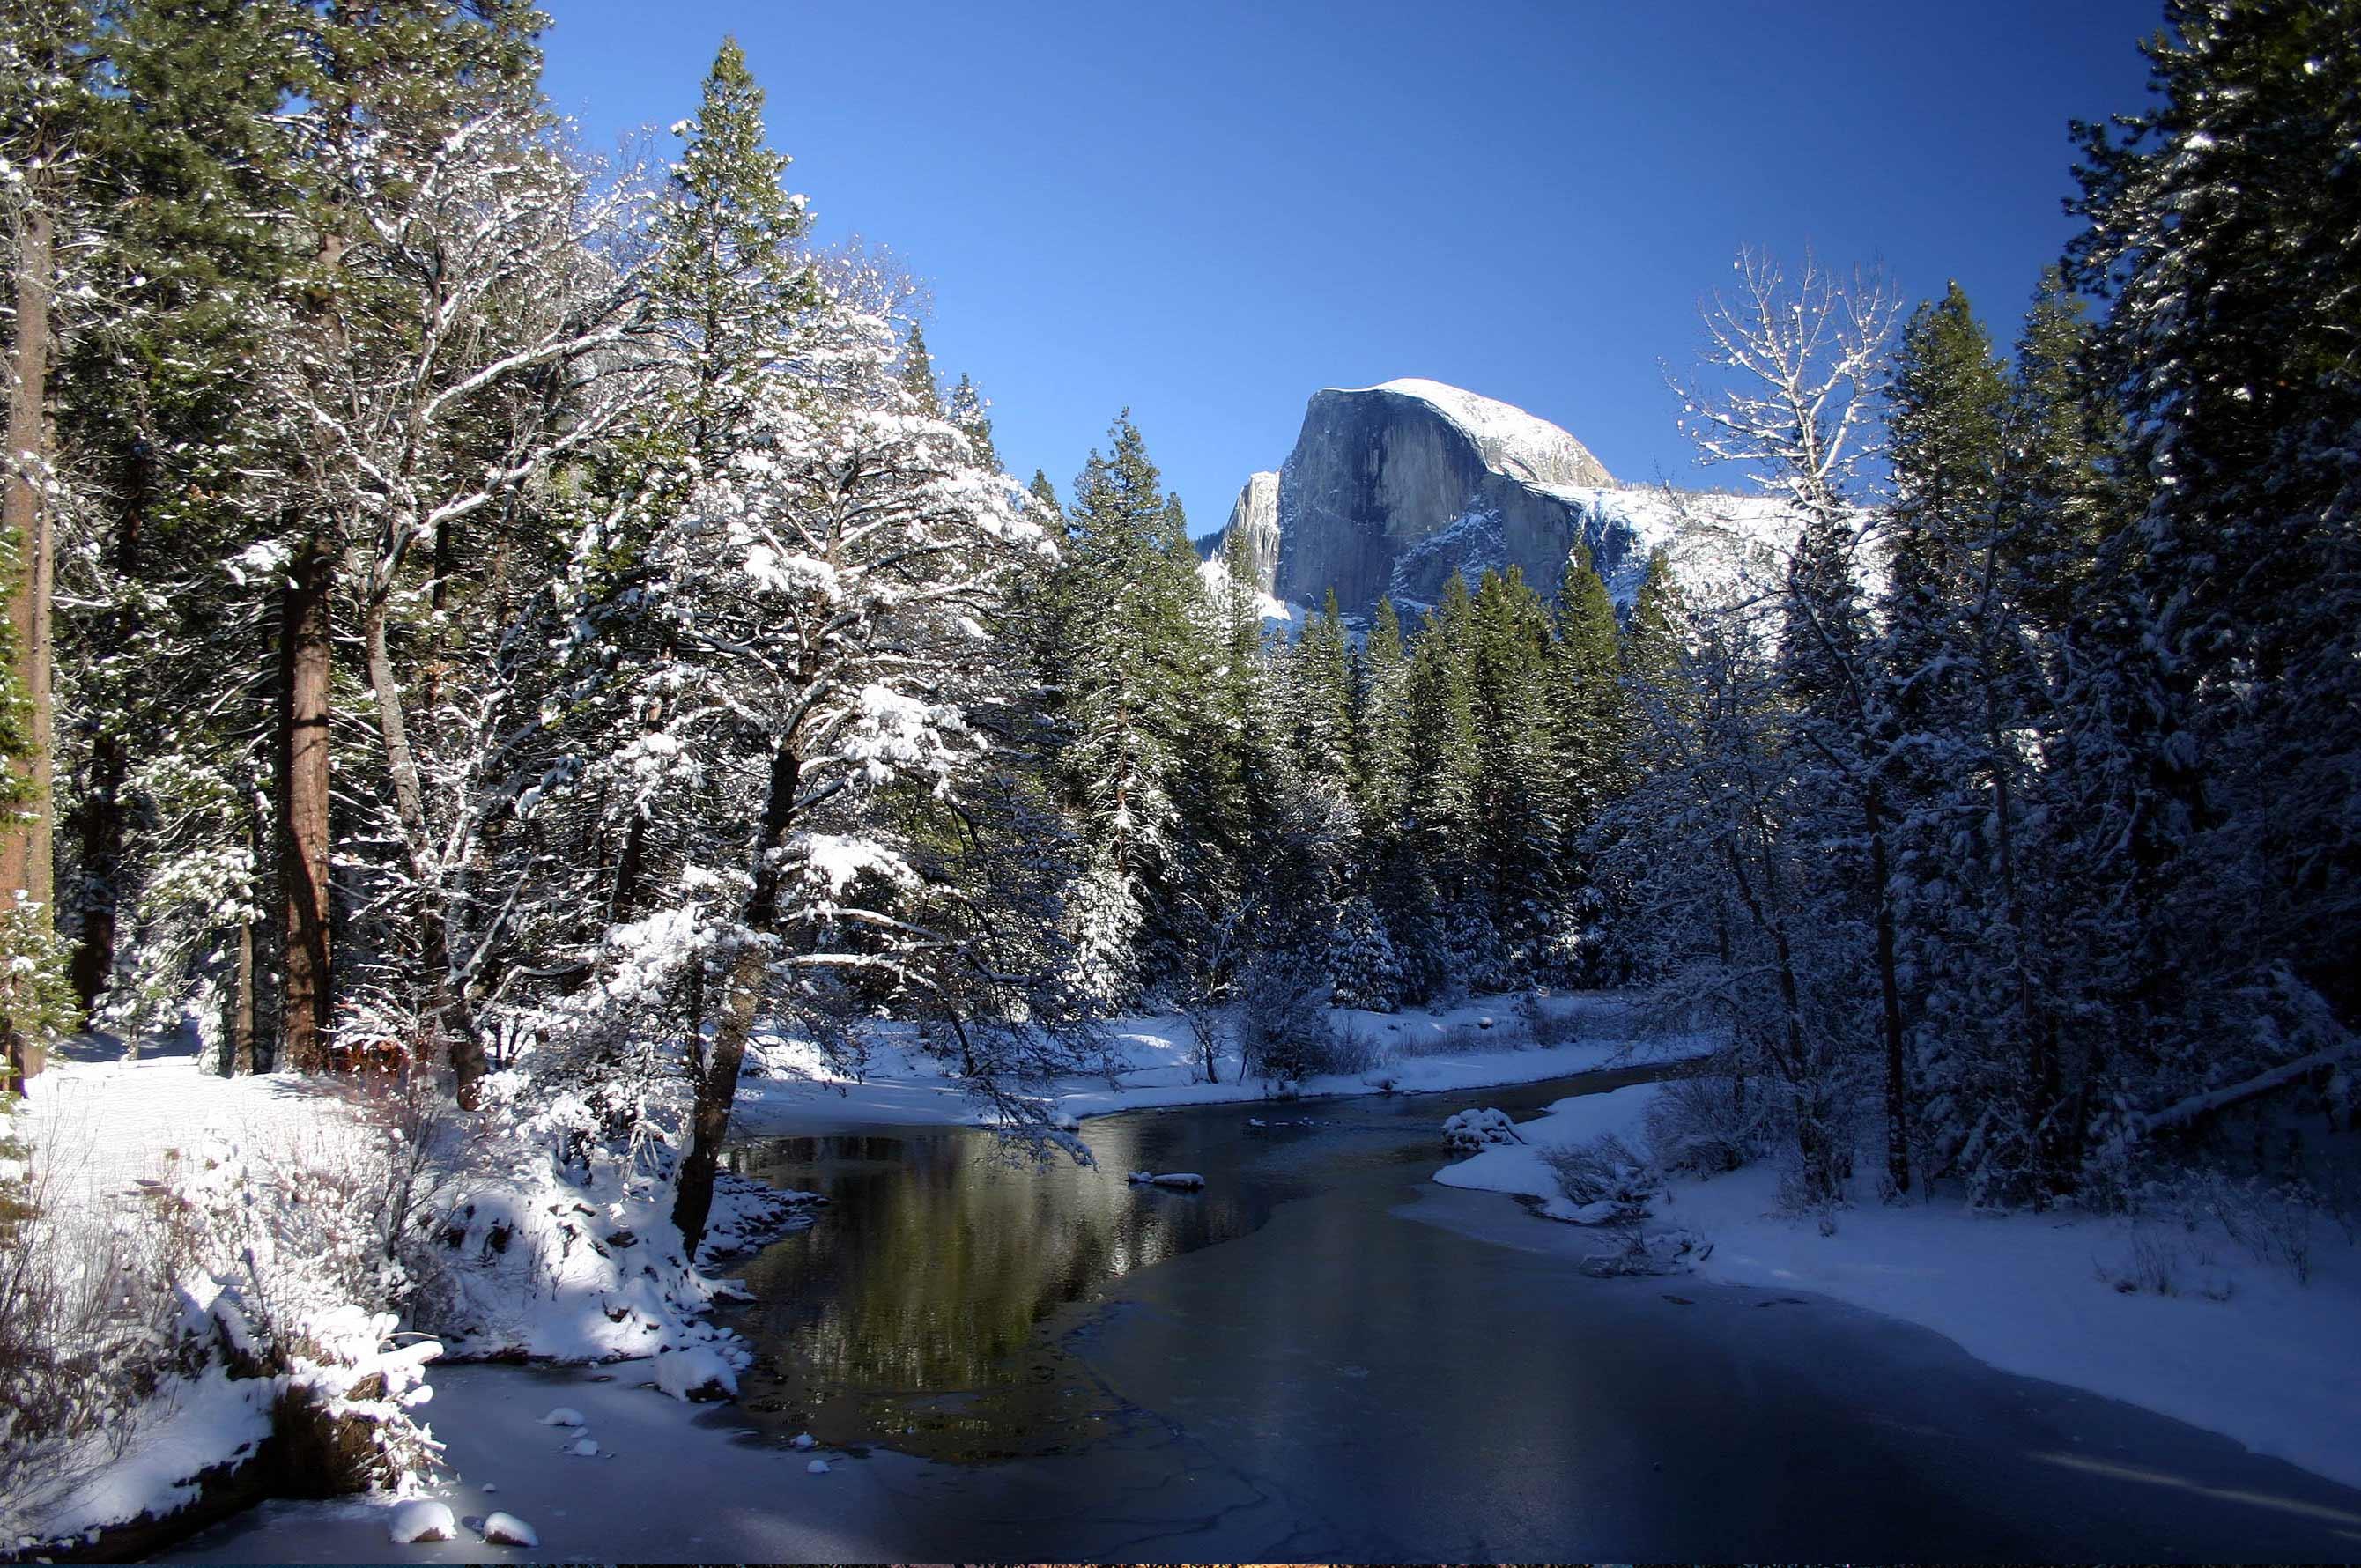 Hiking Trails in Yosemite Valley | yosemitethisyear.com